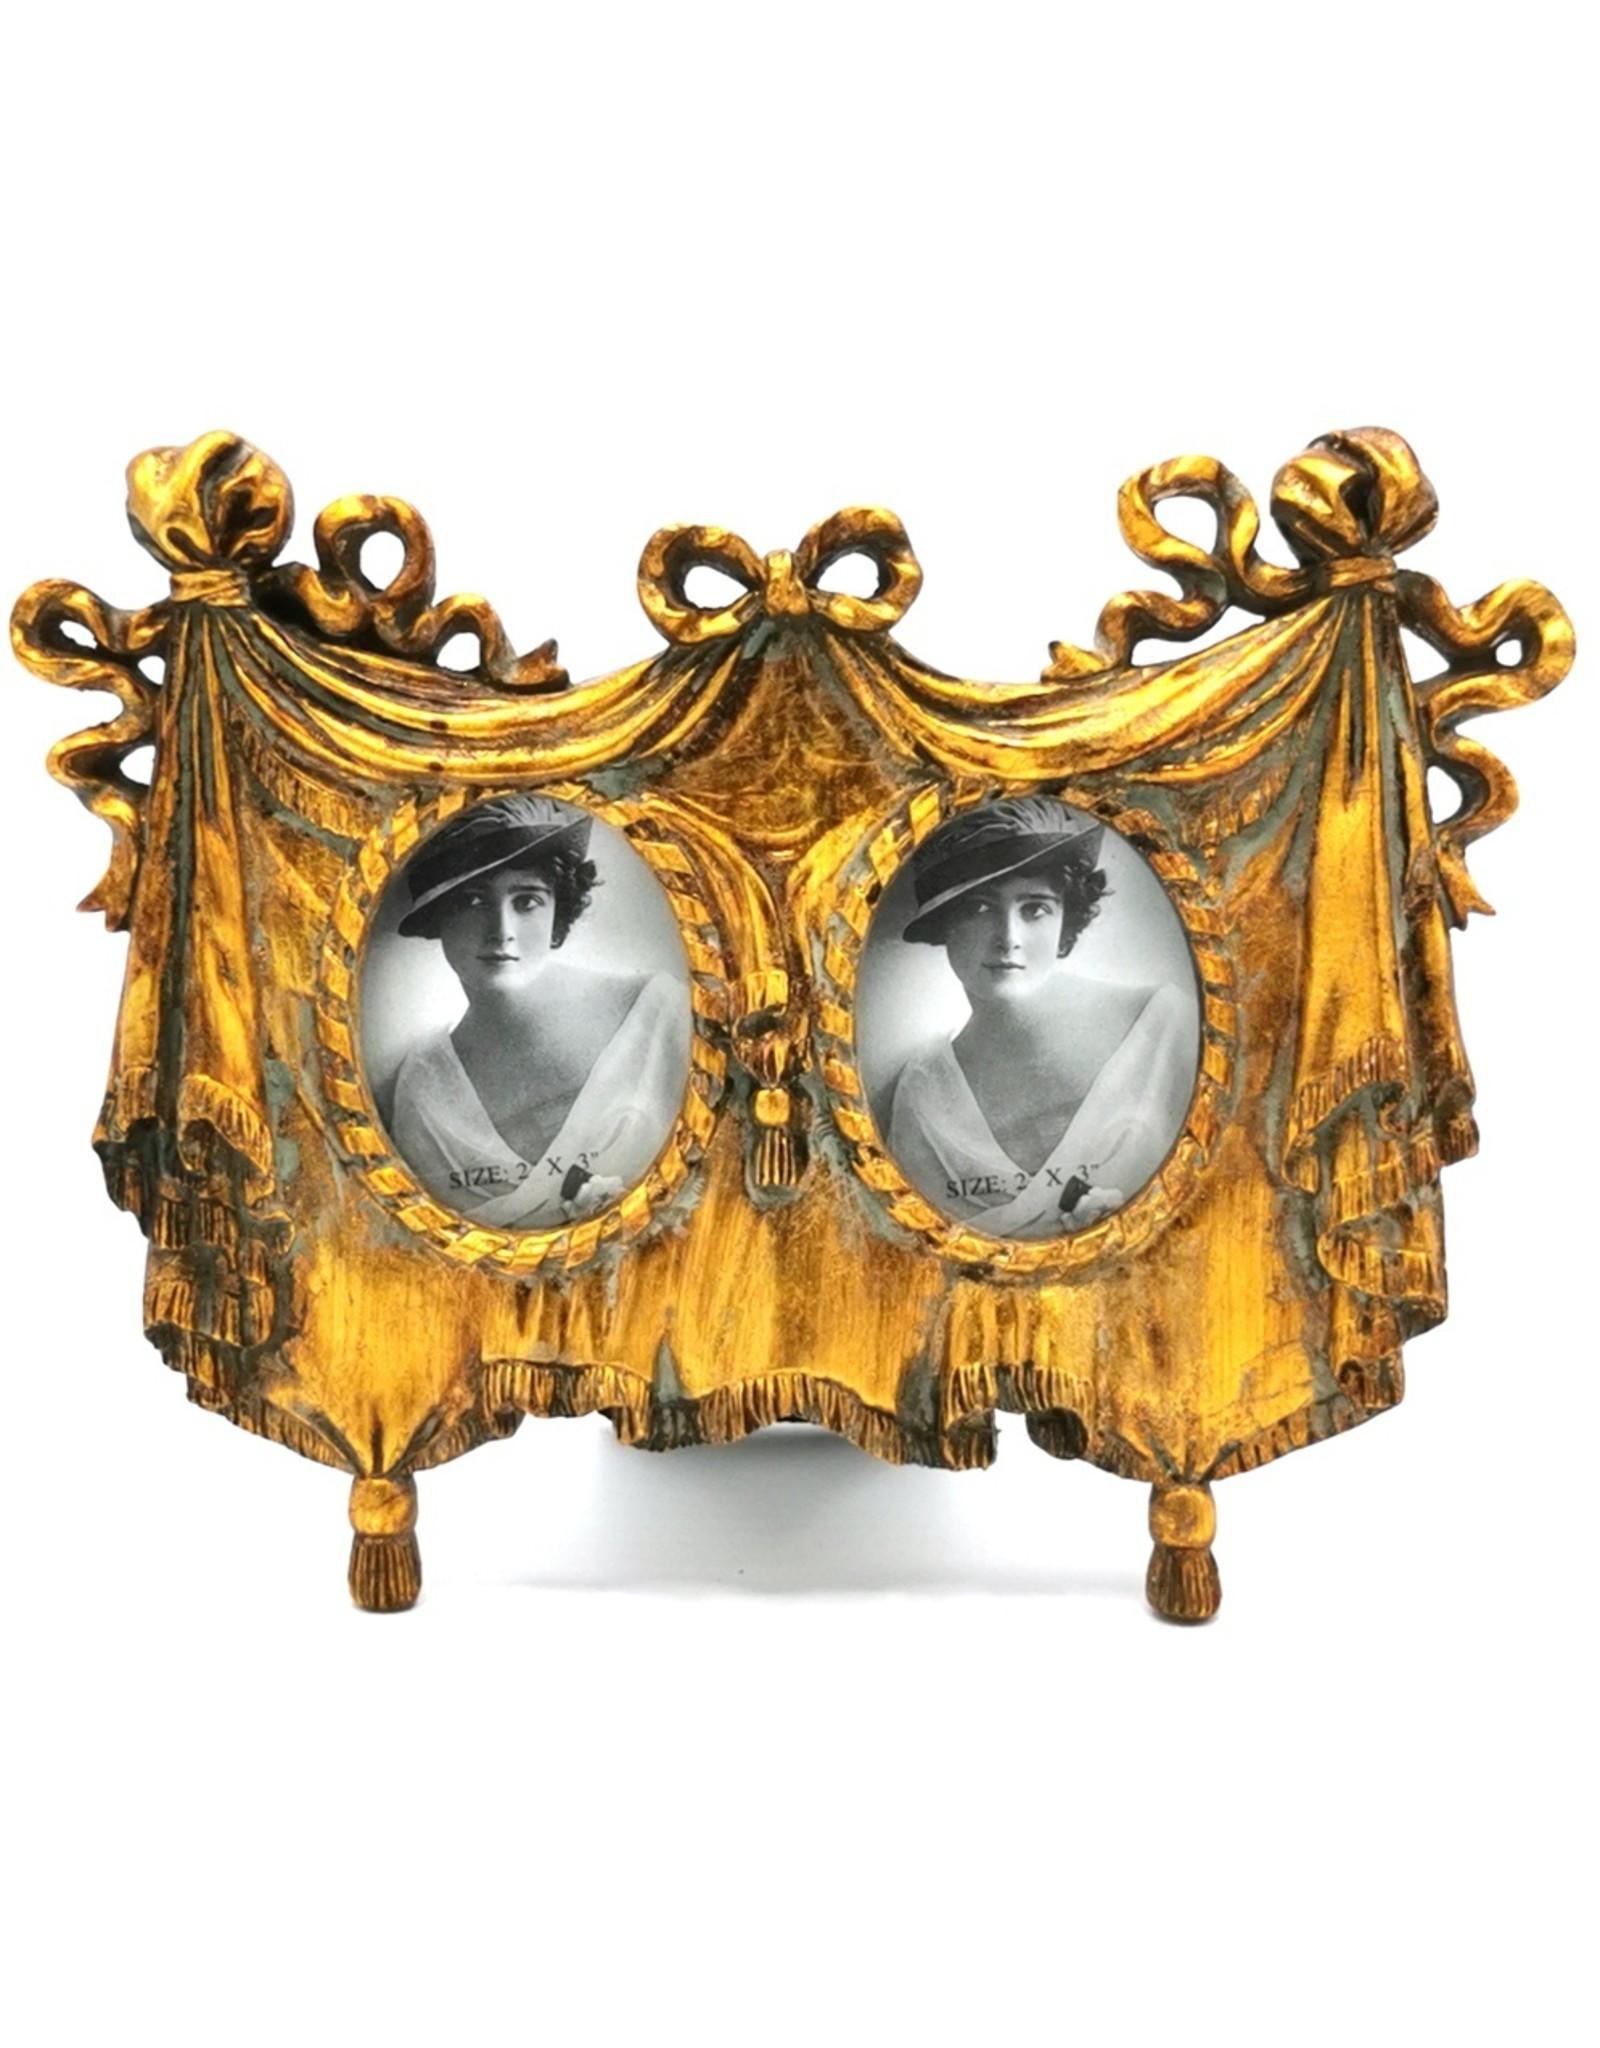 Trukado Miscellaneous - Dubbele Fotolijst jaren '20 stijl goudkleurig